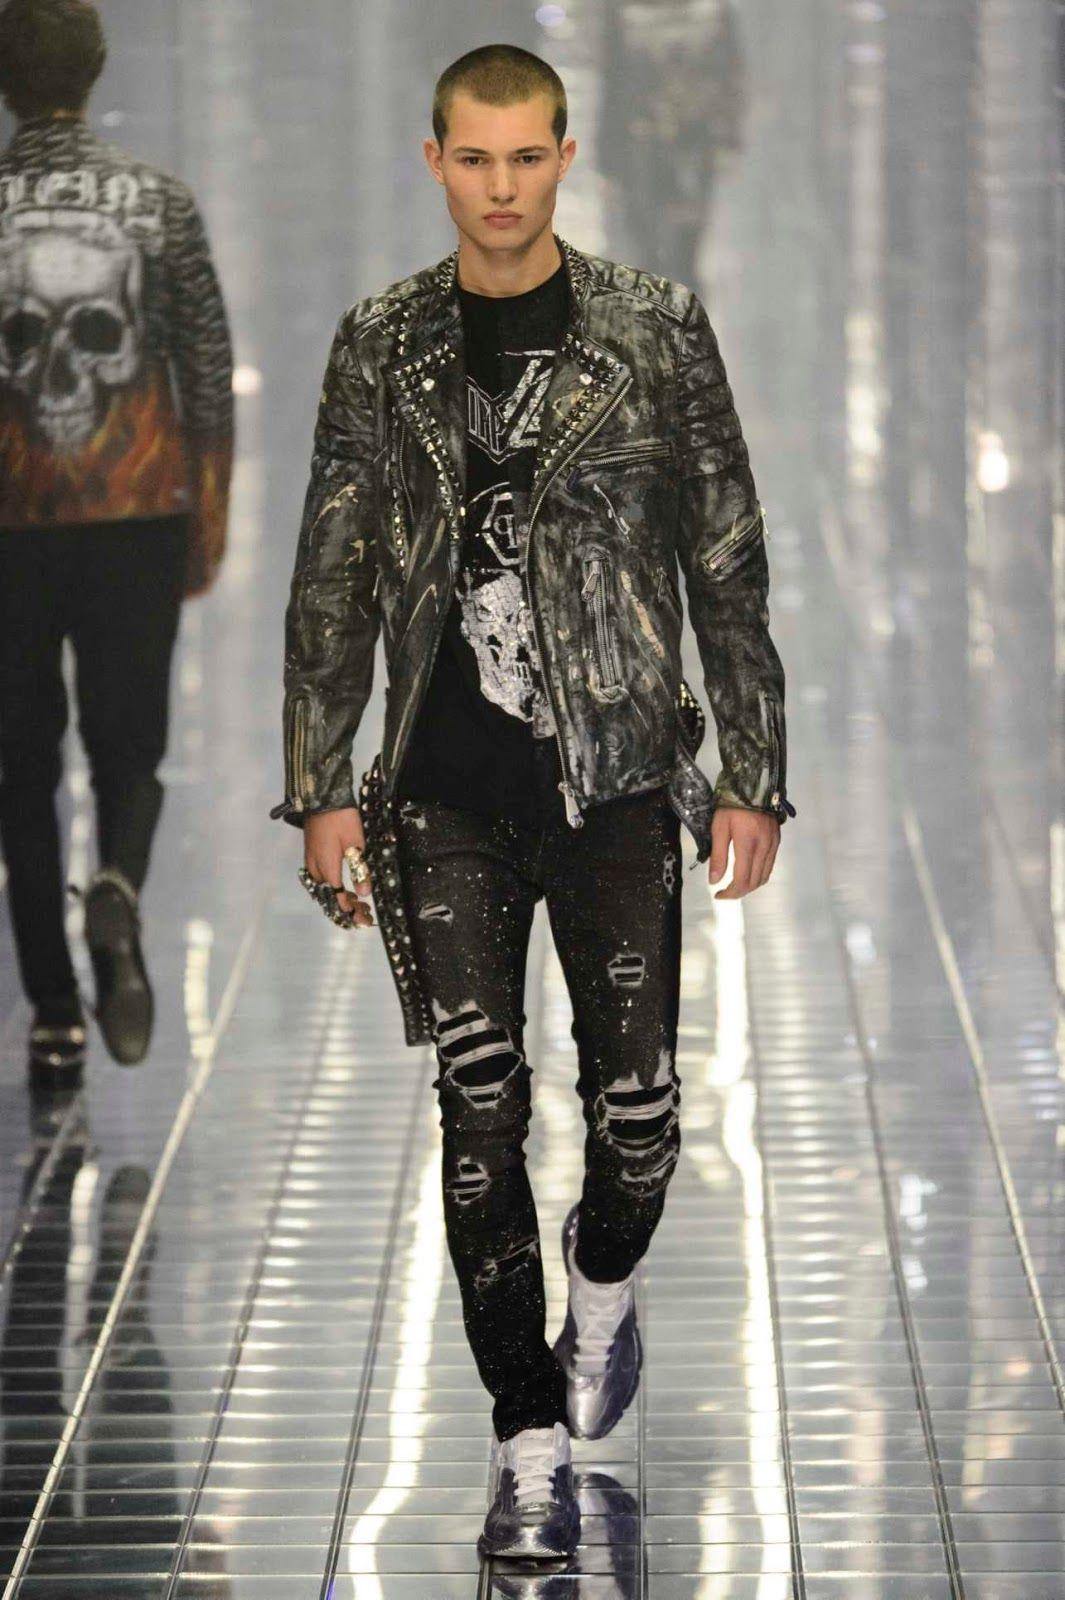 Male Fashion Trends  Philipp Plein Spring-Summer 2019 Runway Show 944475319f87